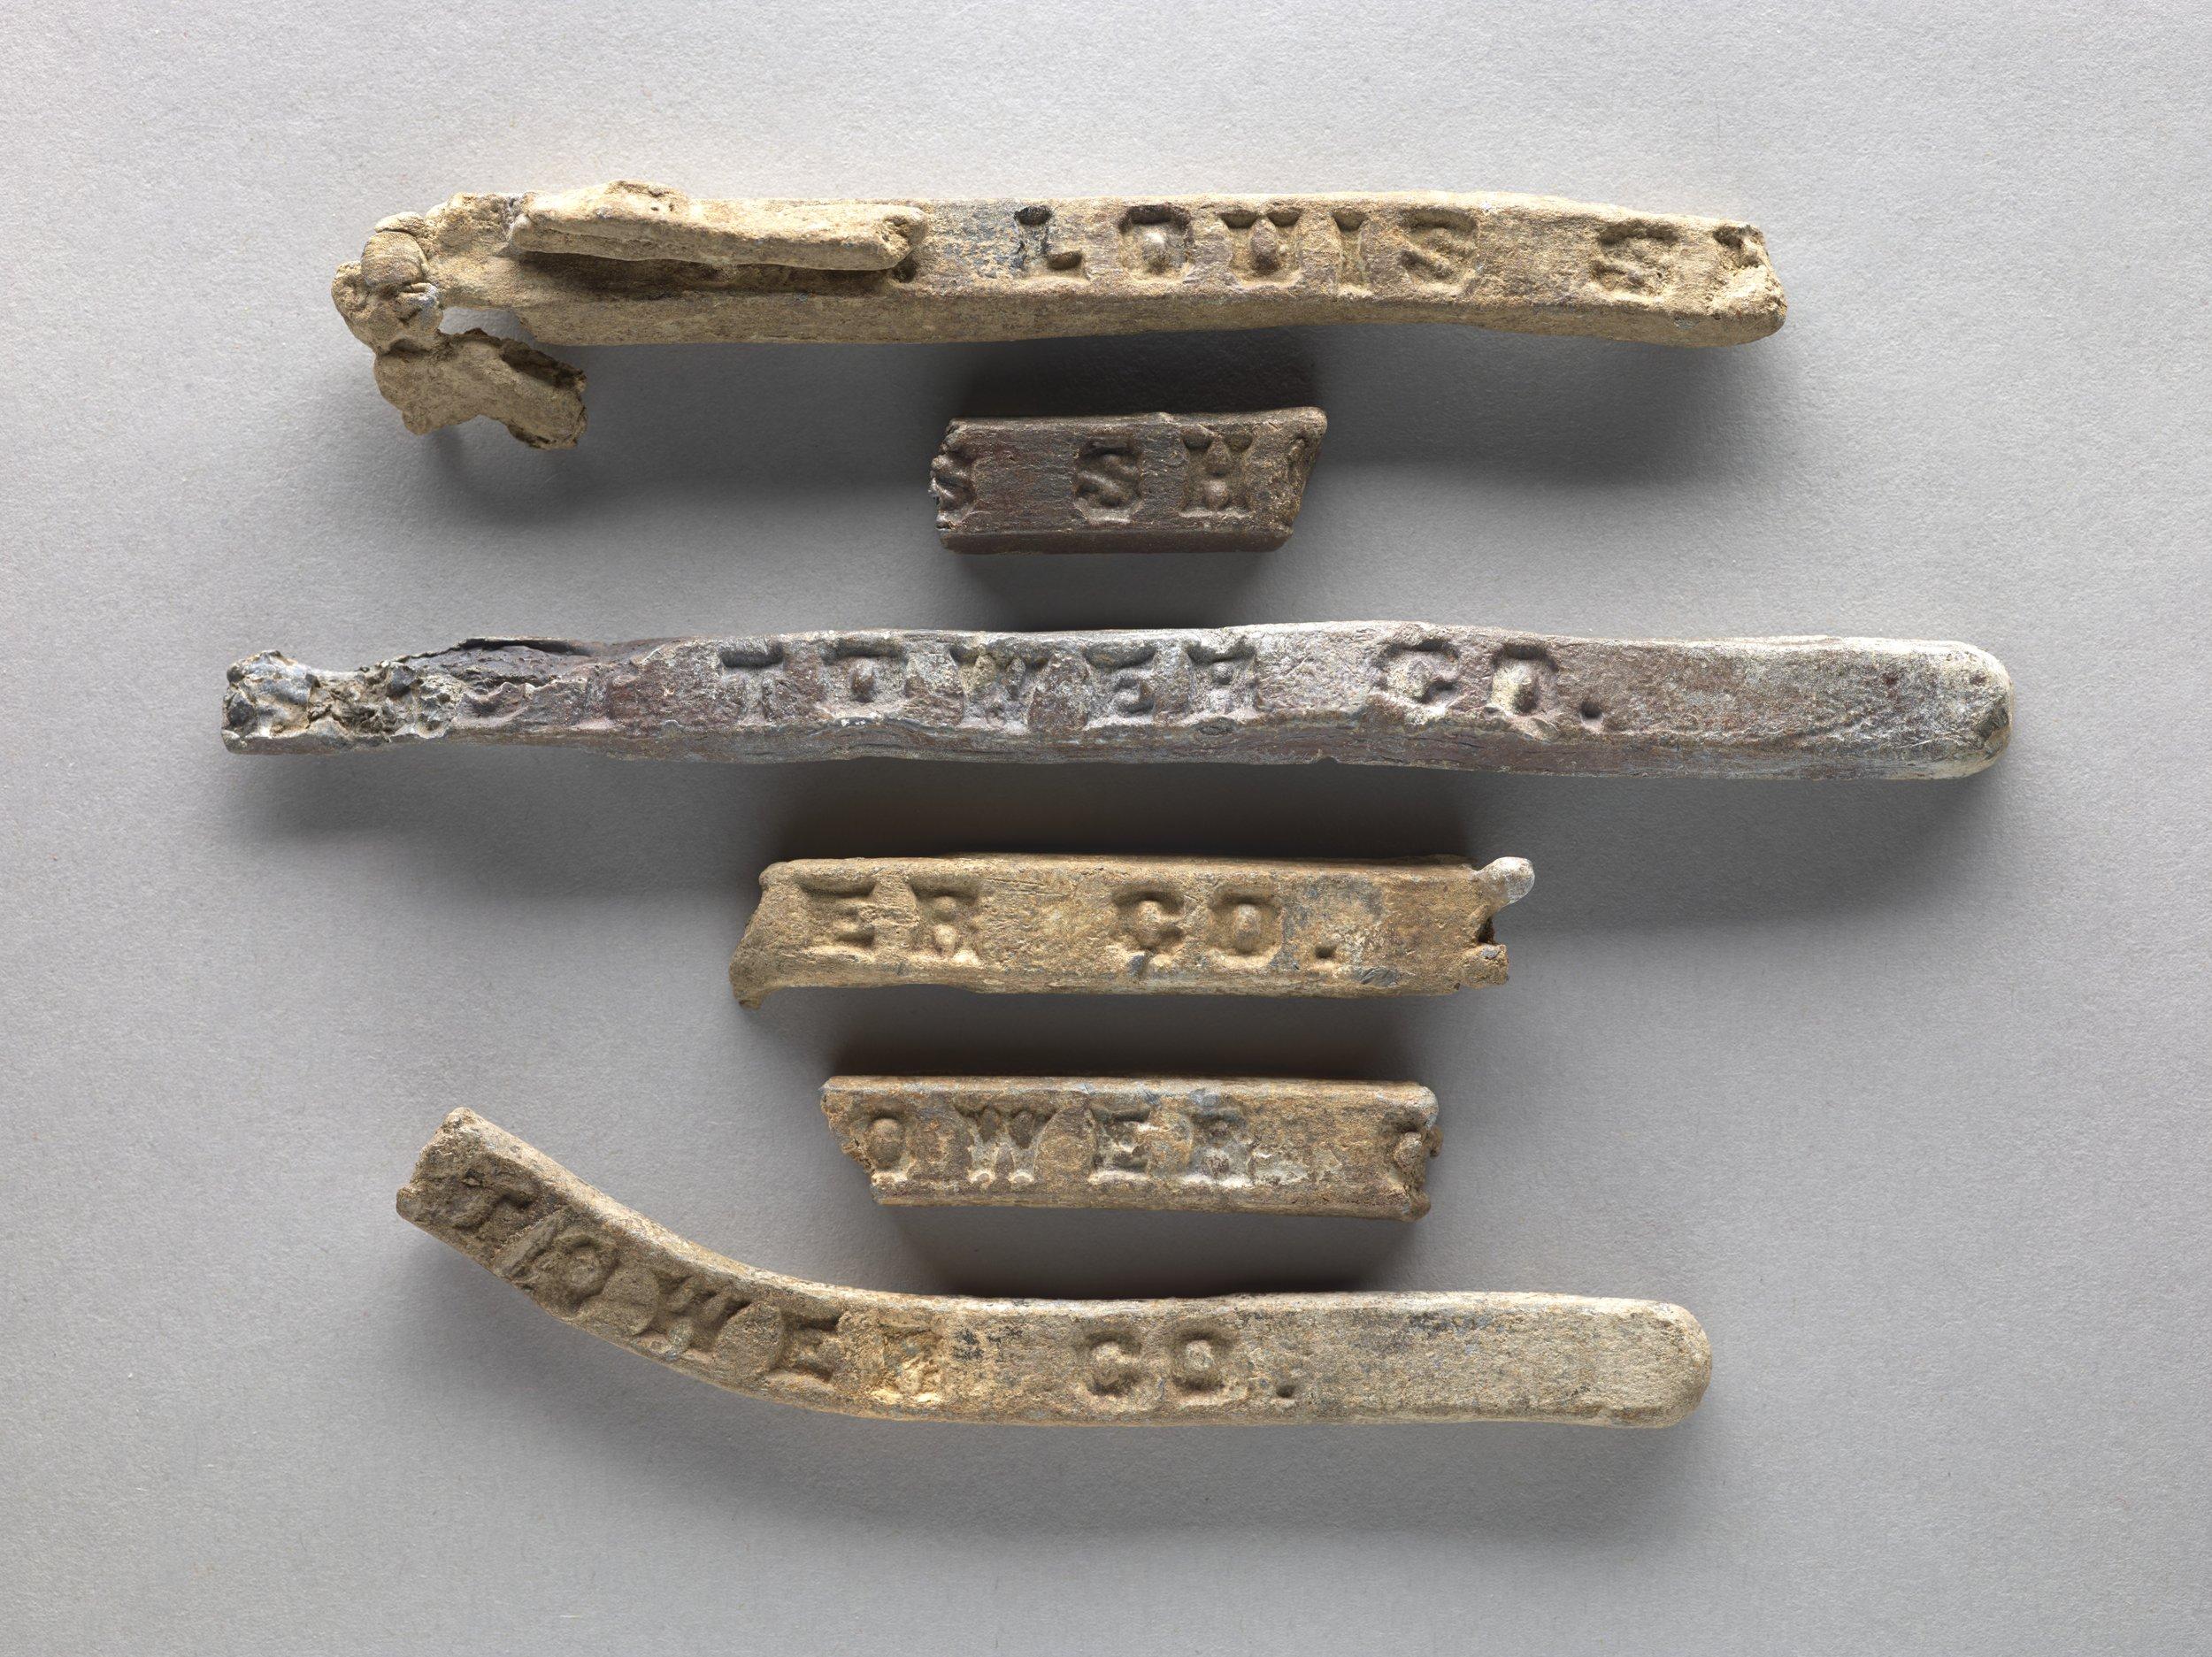 Lead Bars from Fort Zarah, 14BT301 - 2